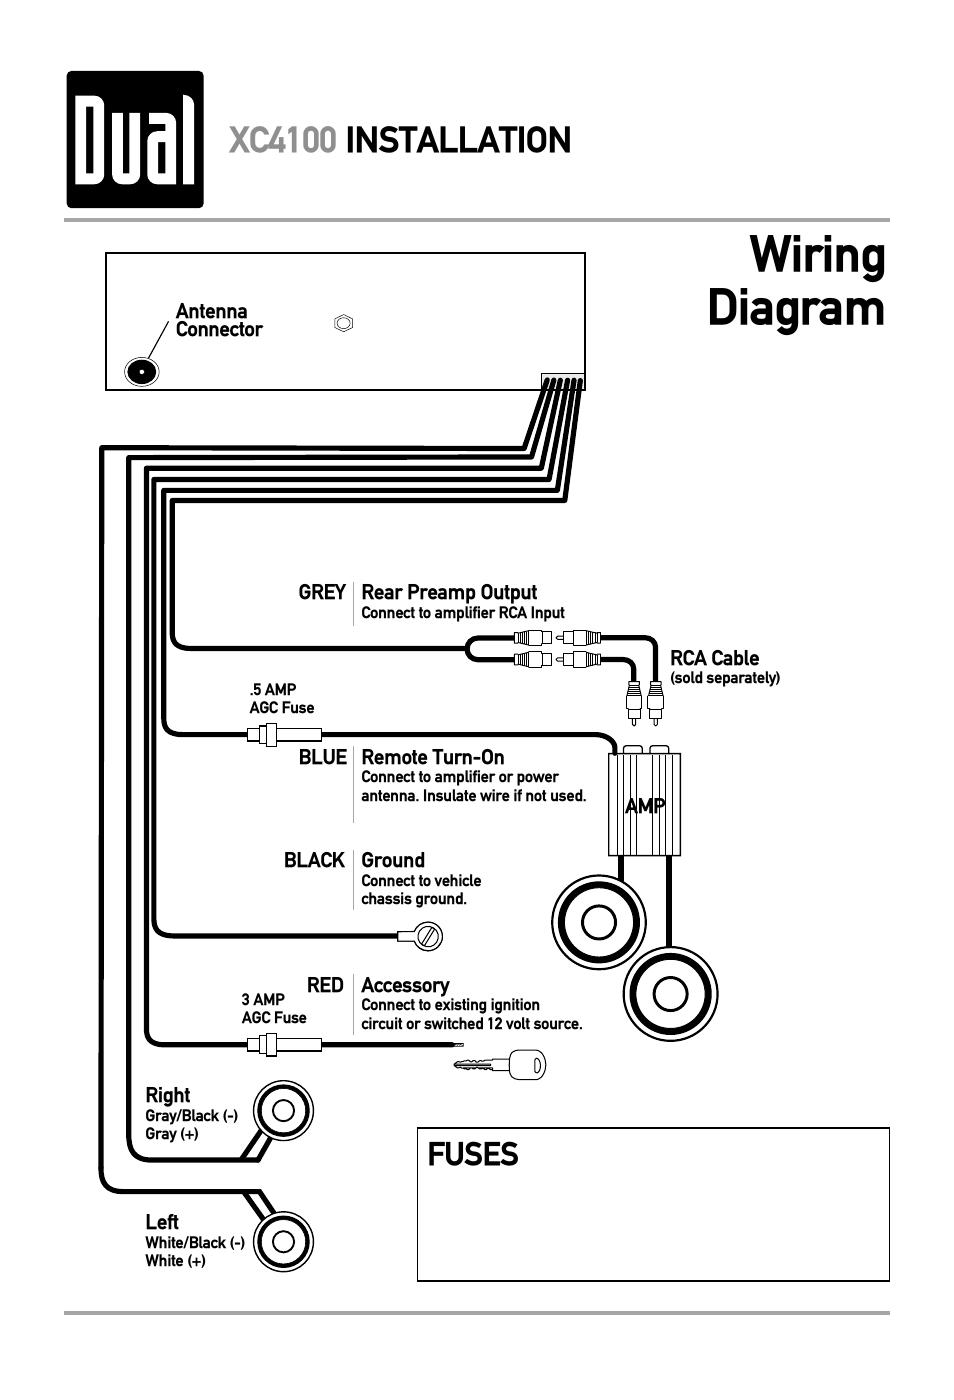 Wiring Diagram Xc Installation Fuses